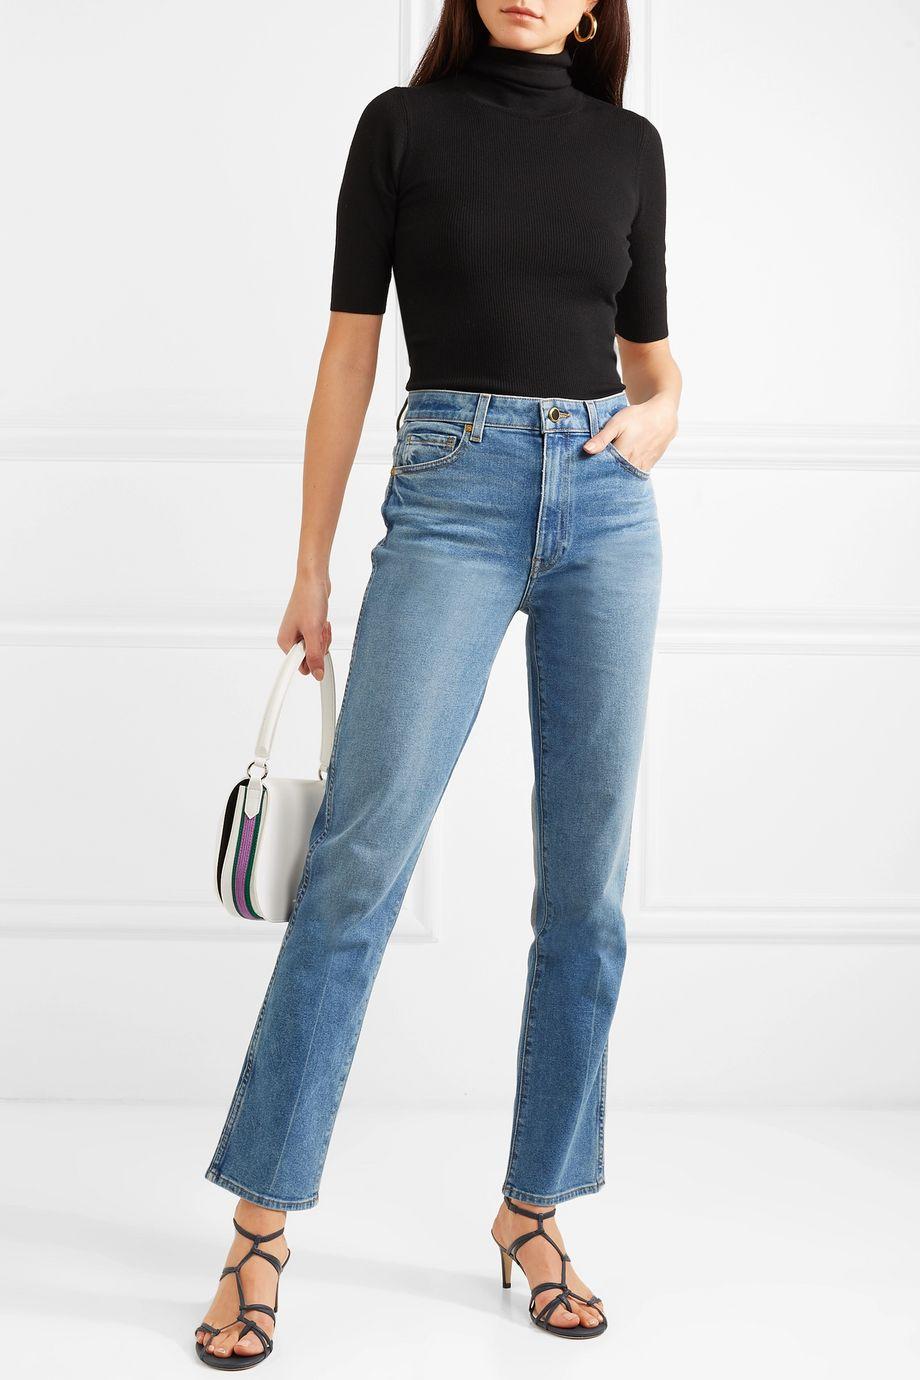 Khaite Victoria 高腰直筒牛仔裤